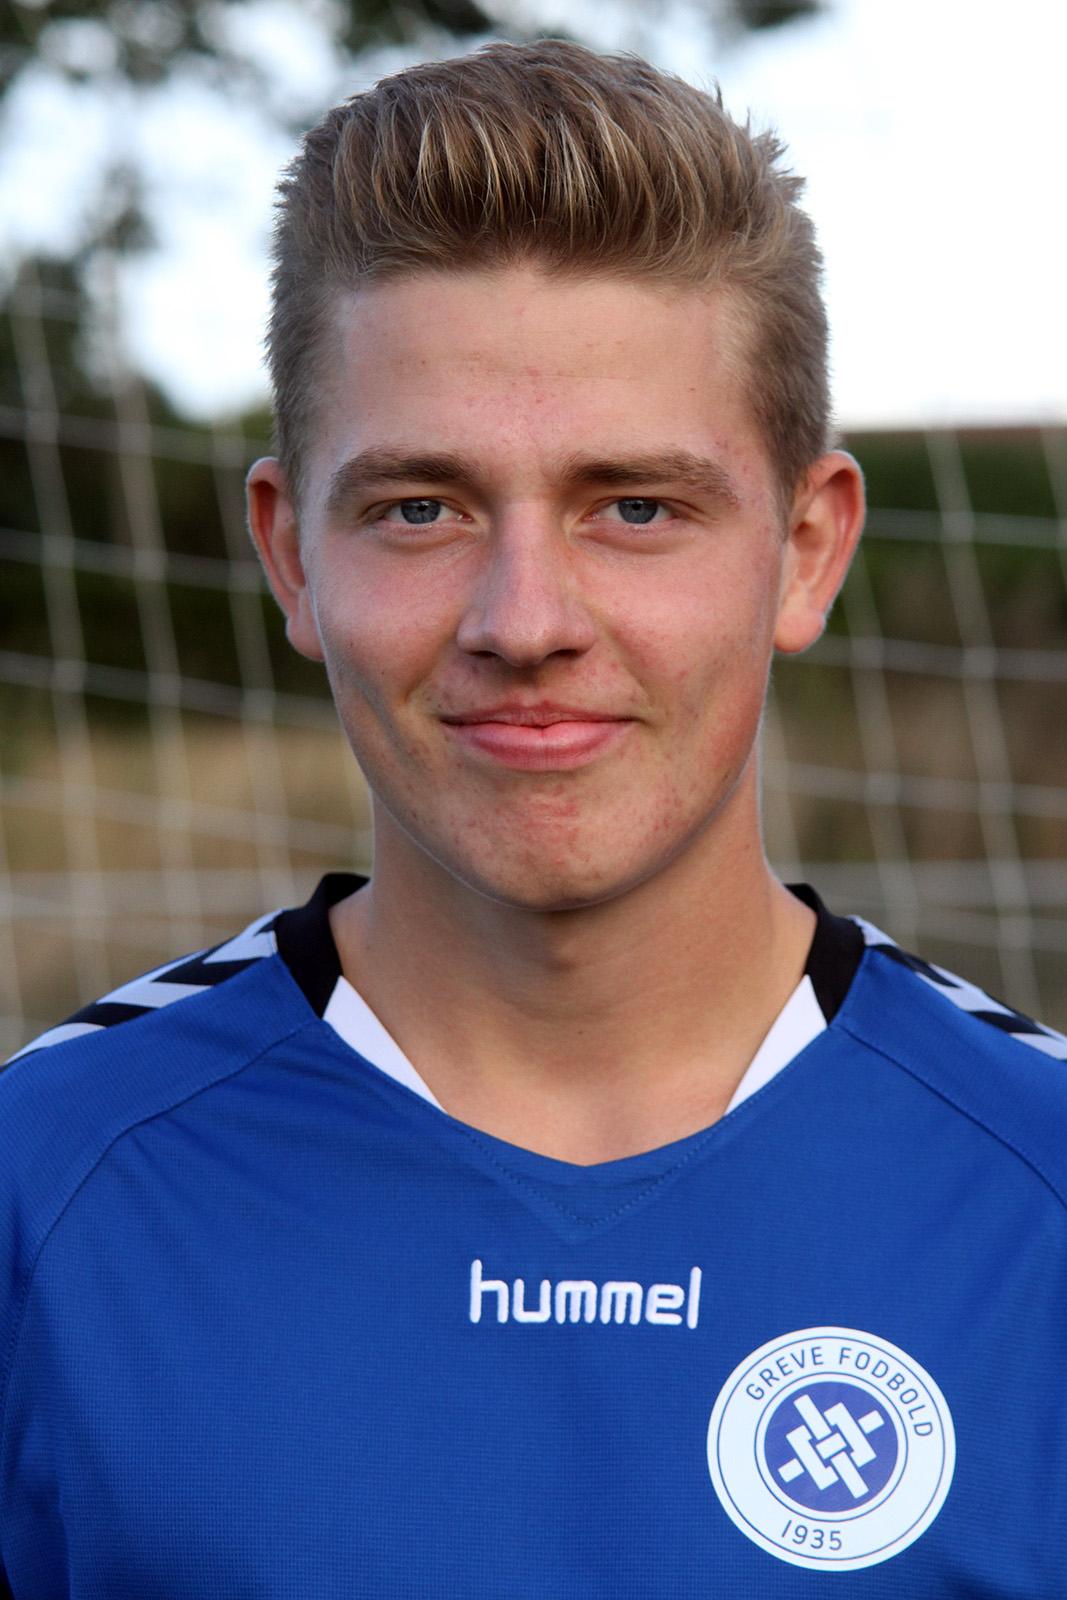 Victor Lundt Balling